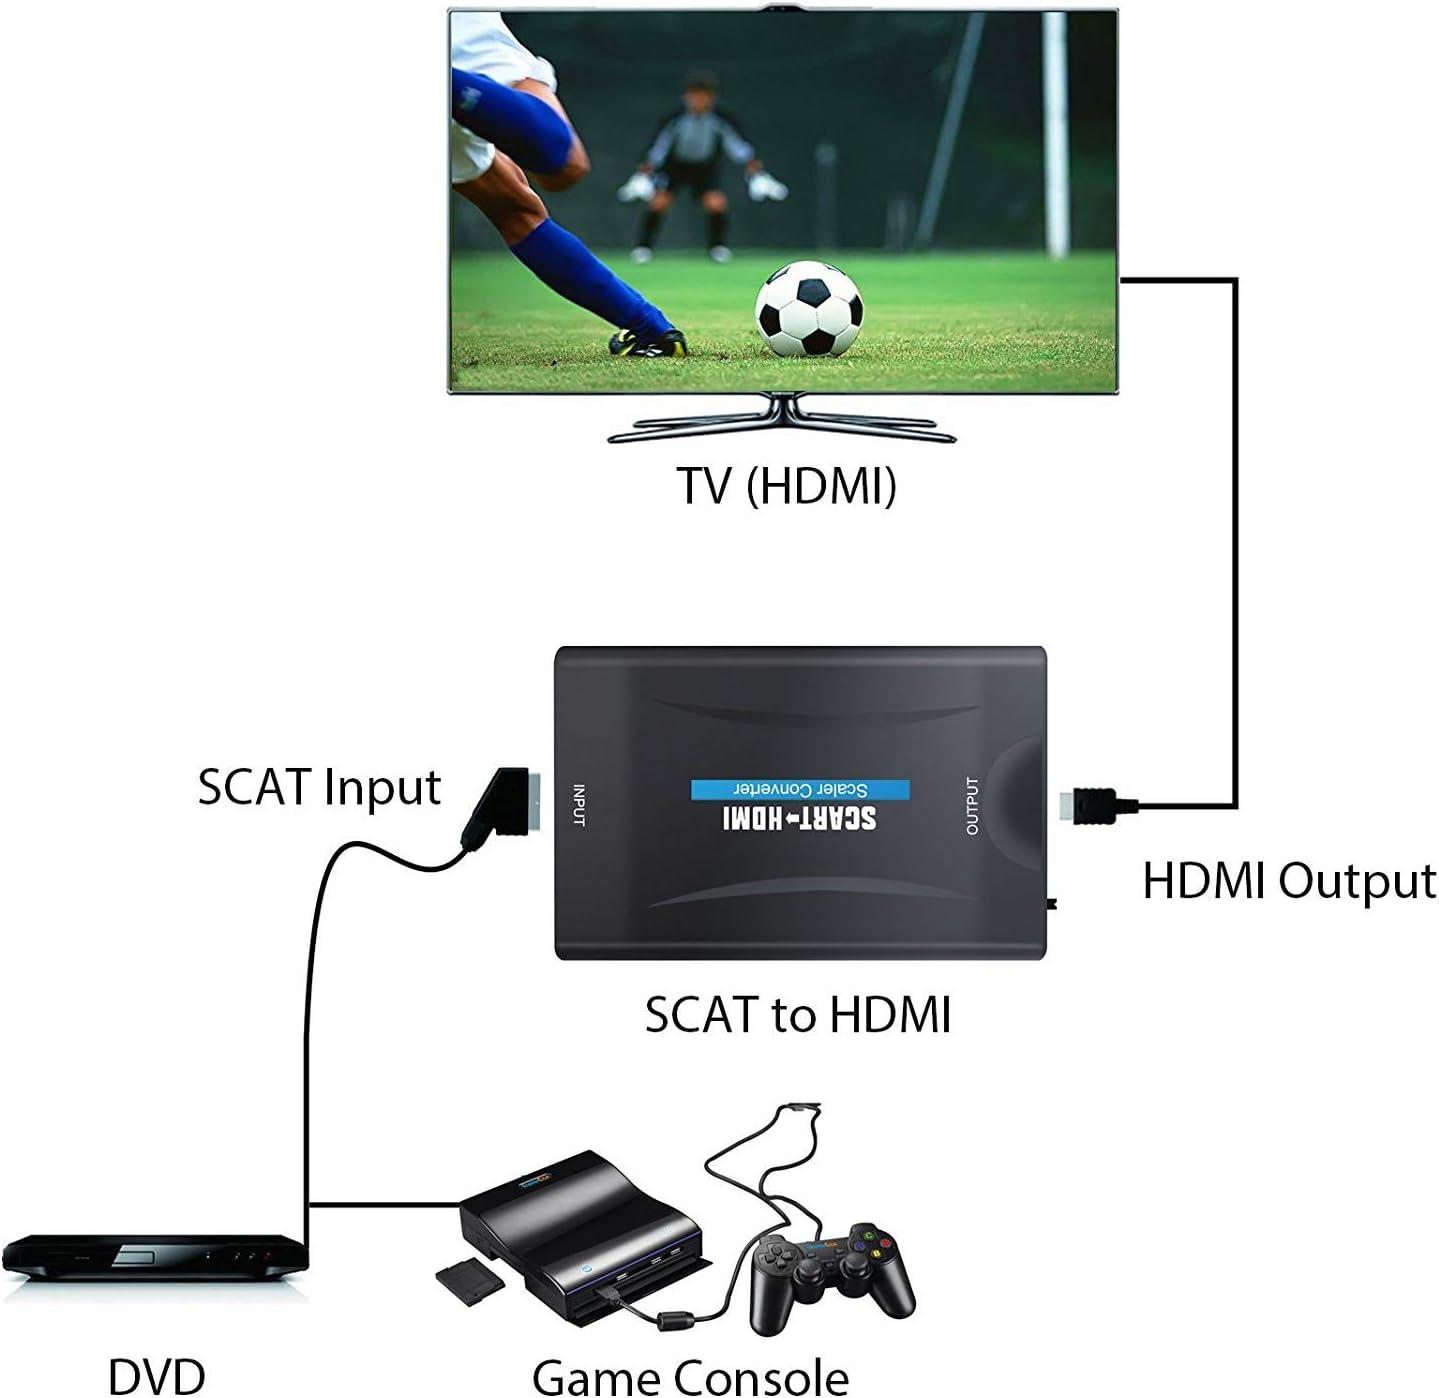 ESYNiC Convertidor de Euroconector a HDMI 1080P Conversor de Scart a HDMI HD Vídeo Compuesto Adaptador de Vídeo Escalador para Inteligente Teléfono Sky HDTV DVD Blu- ray: Amazon.es: Electrónica